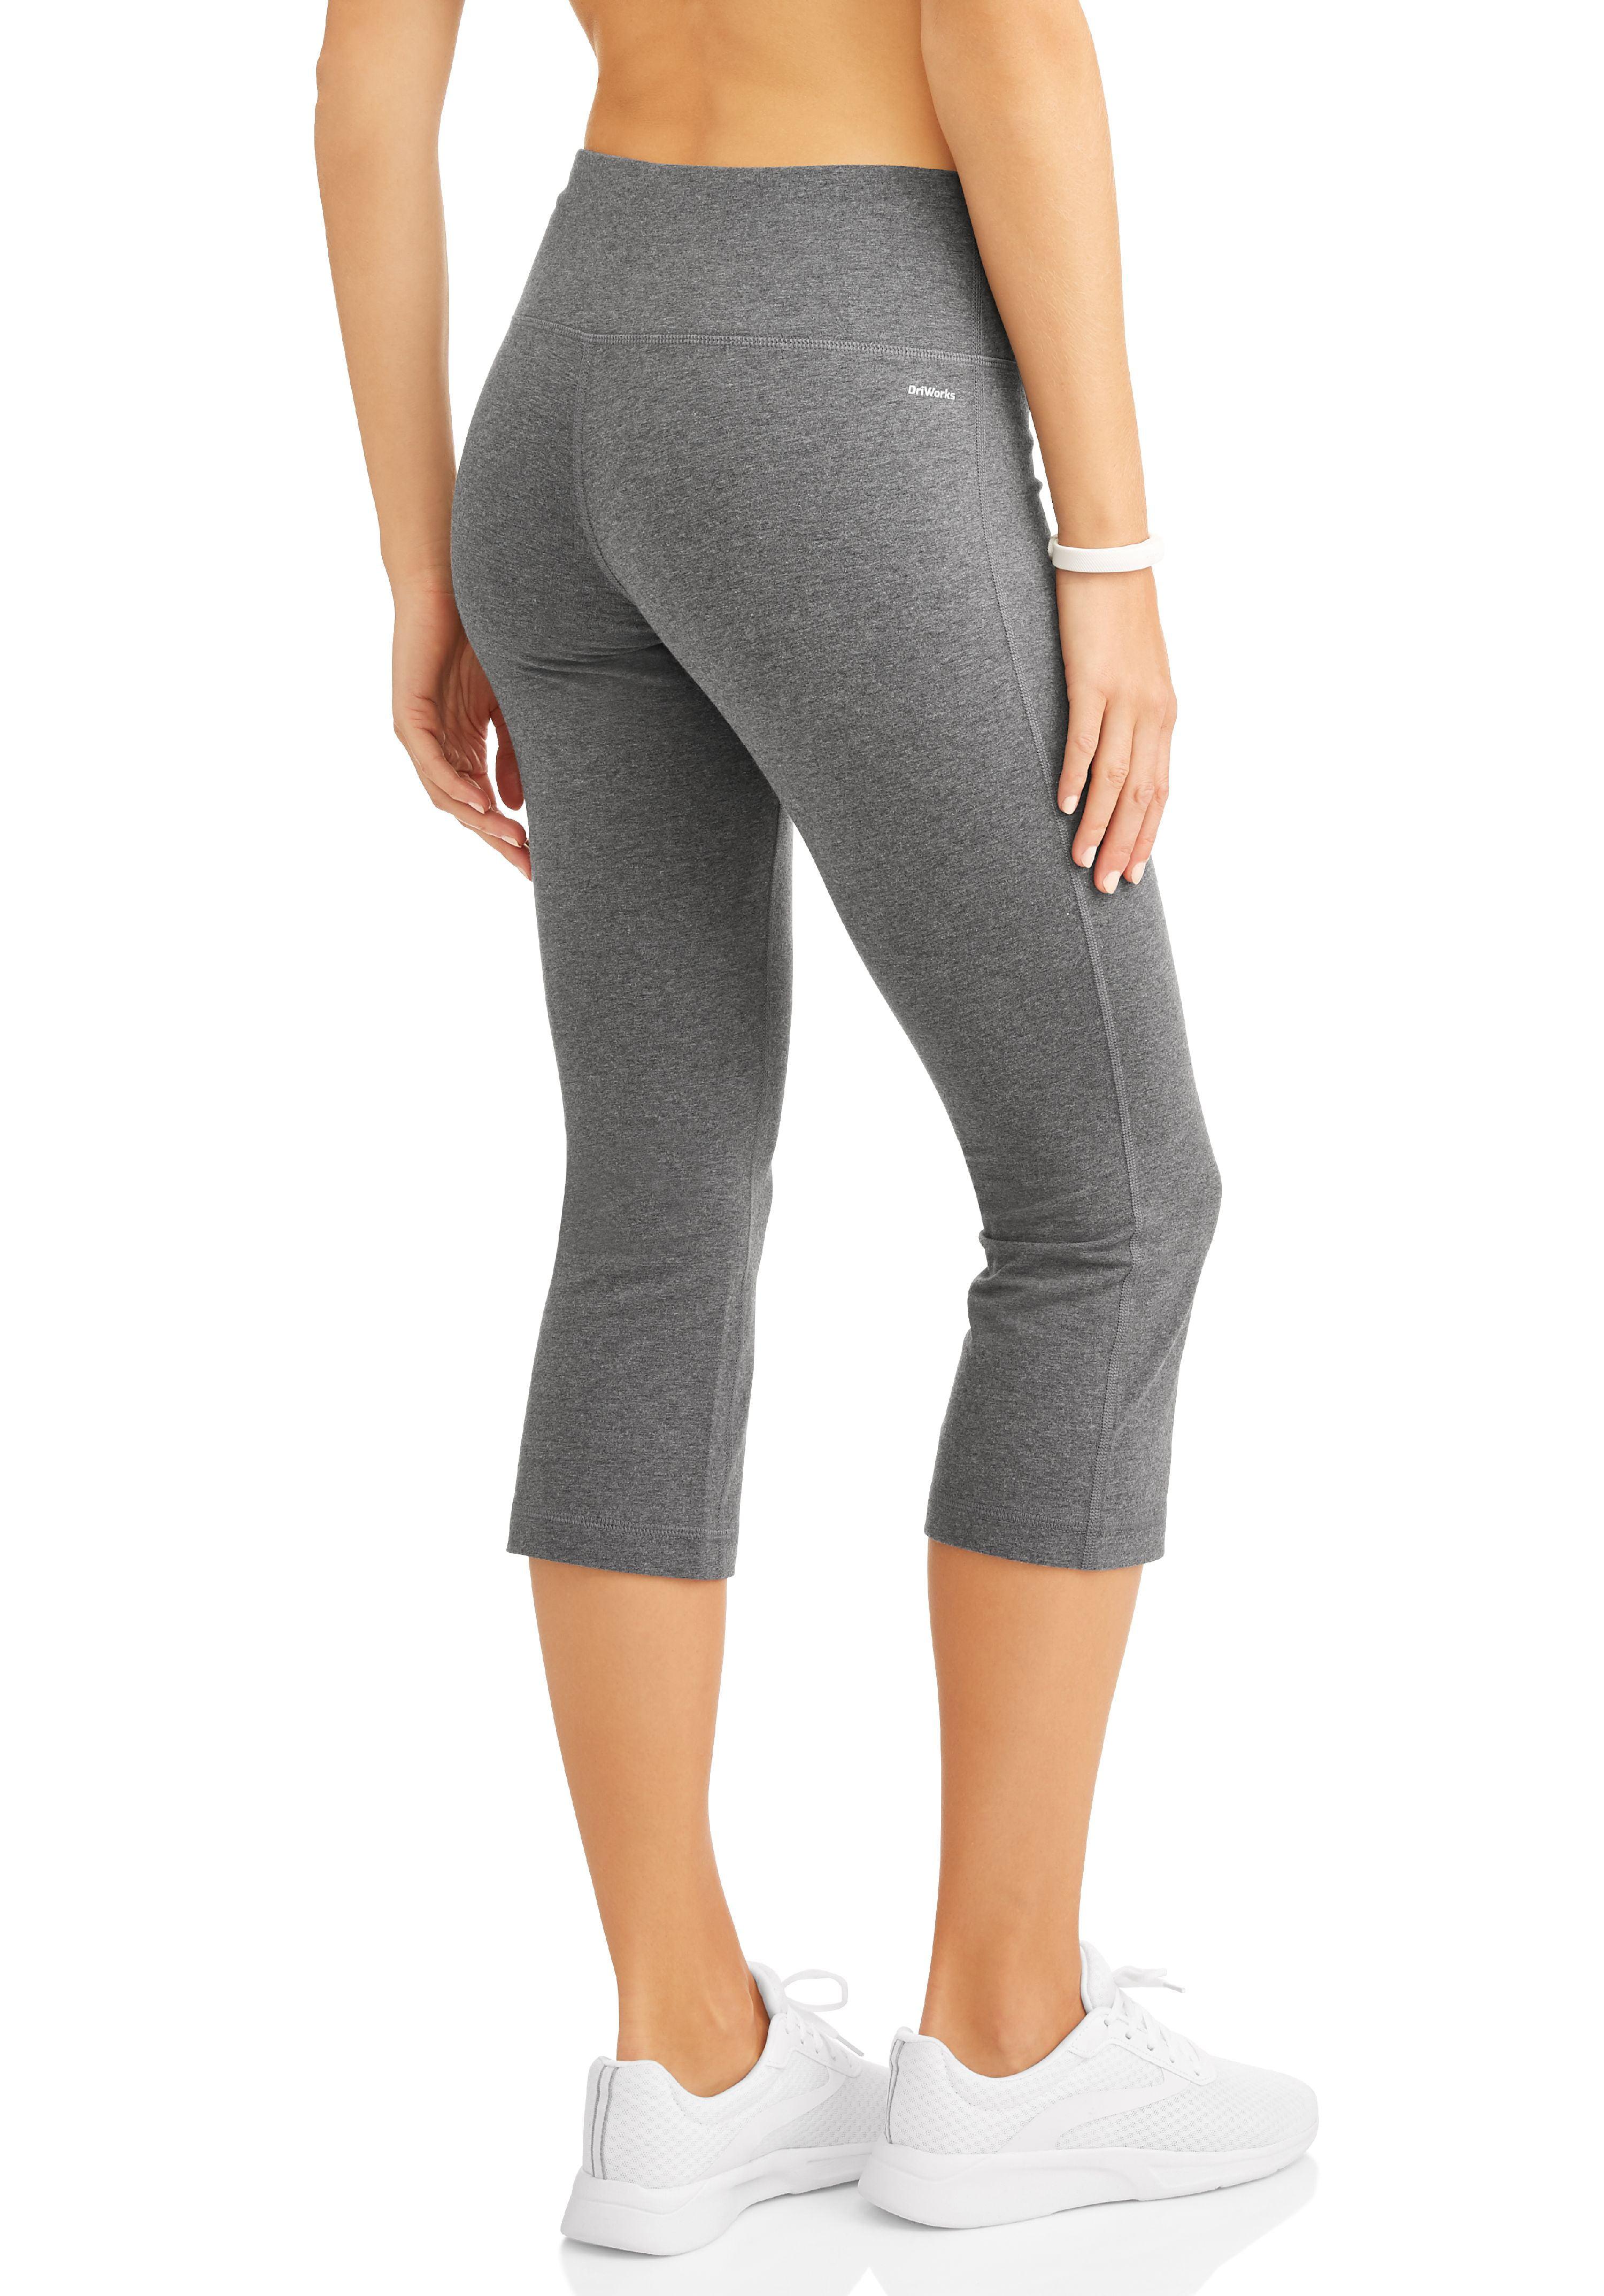 Athletic Works - Women's Active Core Yoga Capri Pant - Walmart.com